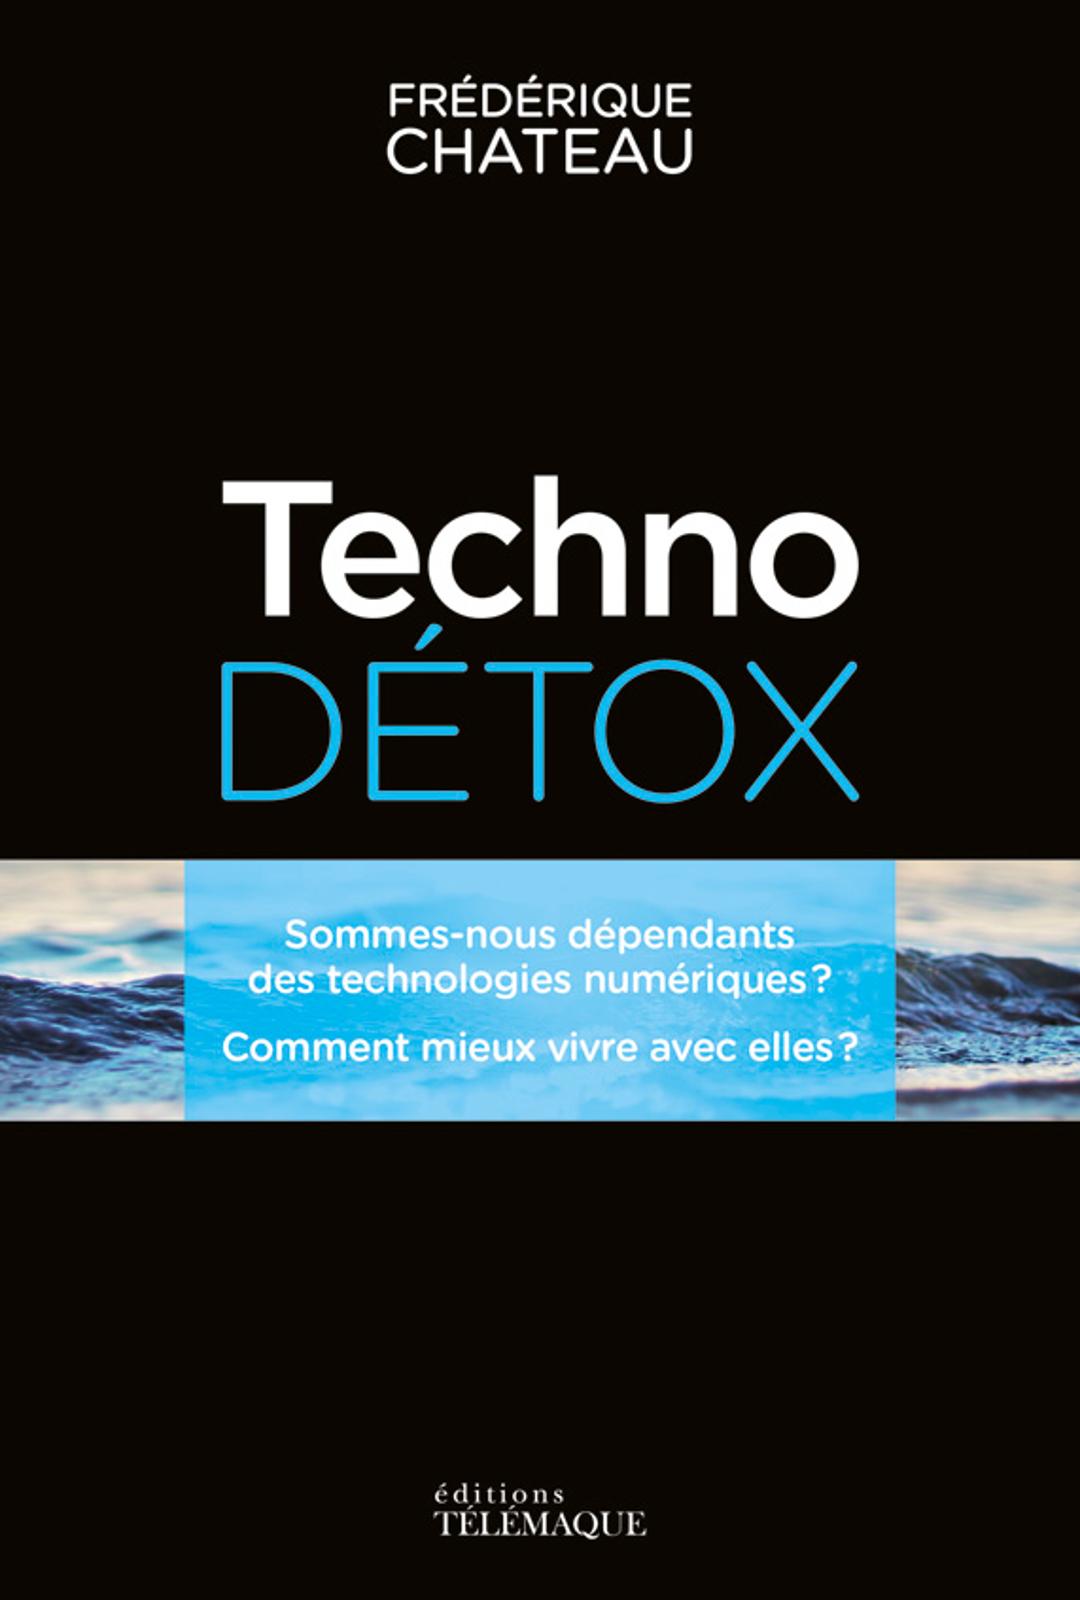 Techno-détox